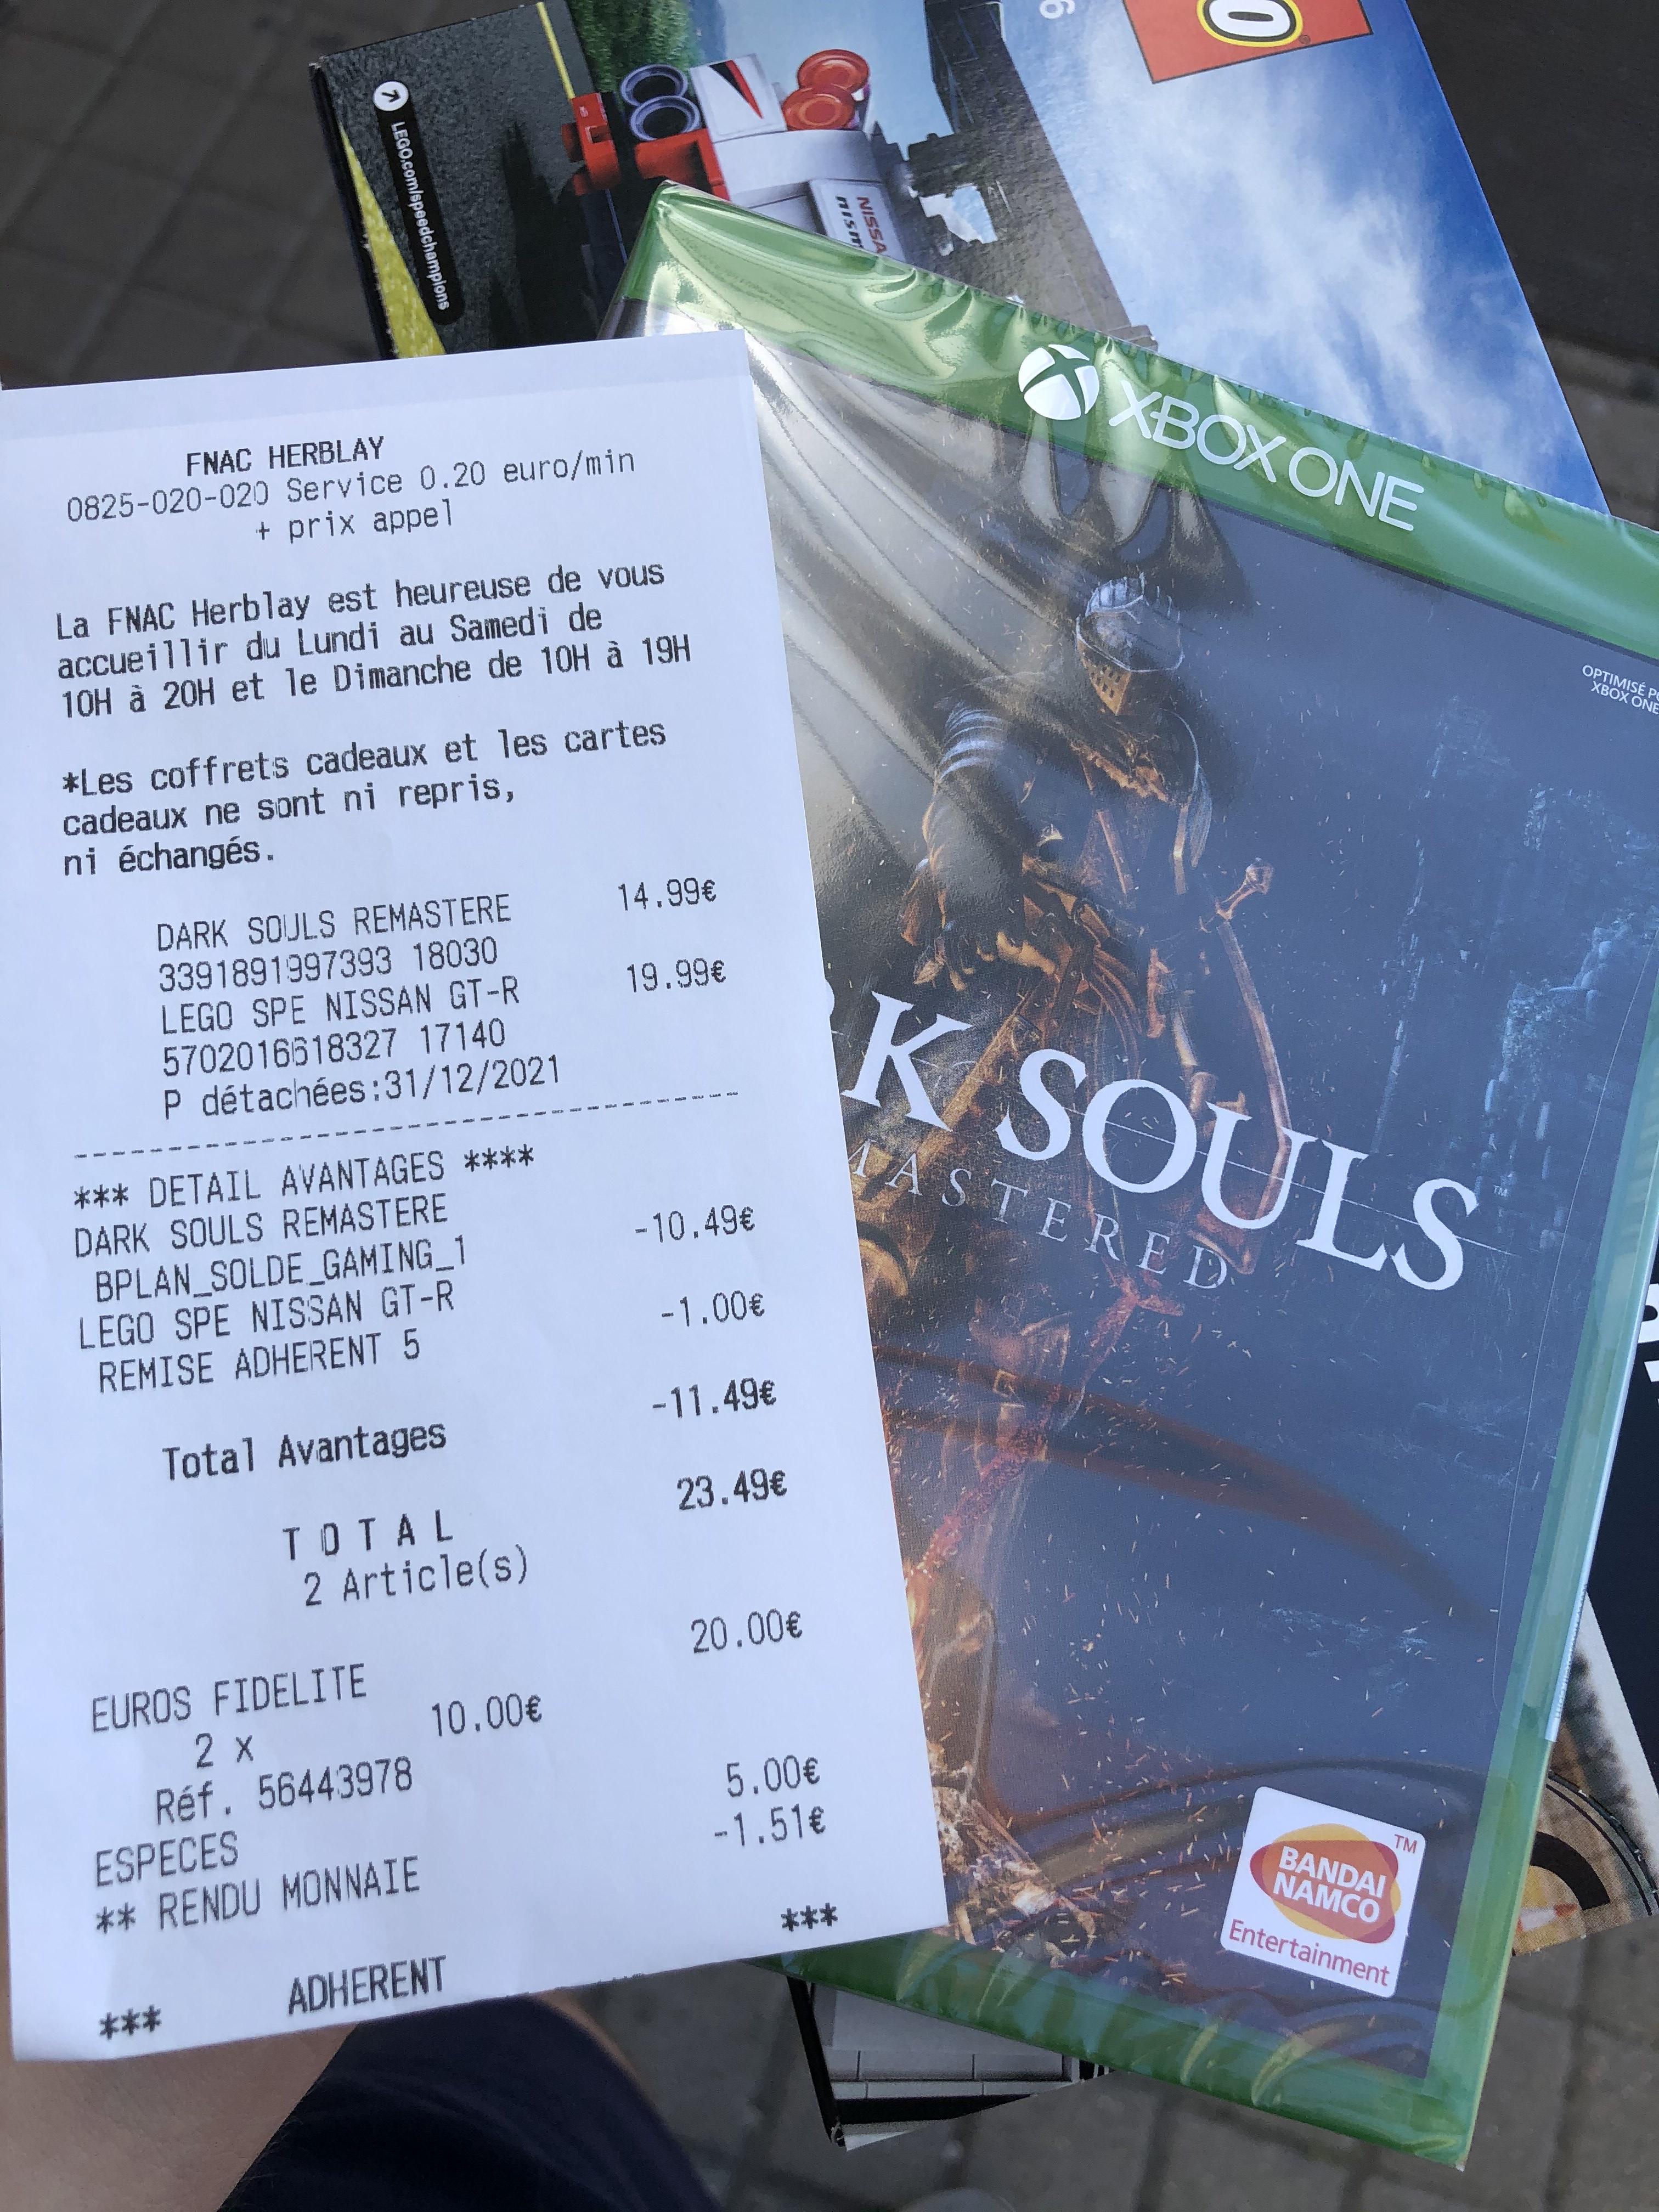 Dark Souls Remastered sur Xbox One - Herblay (95)